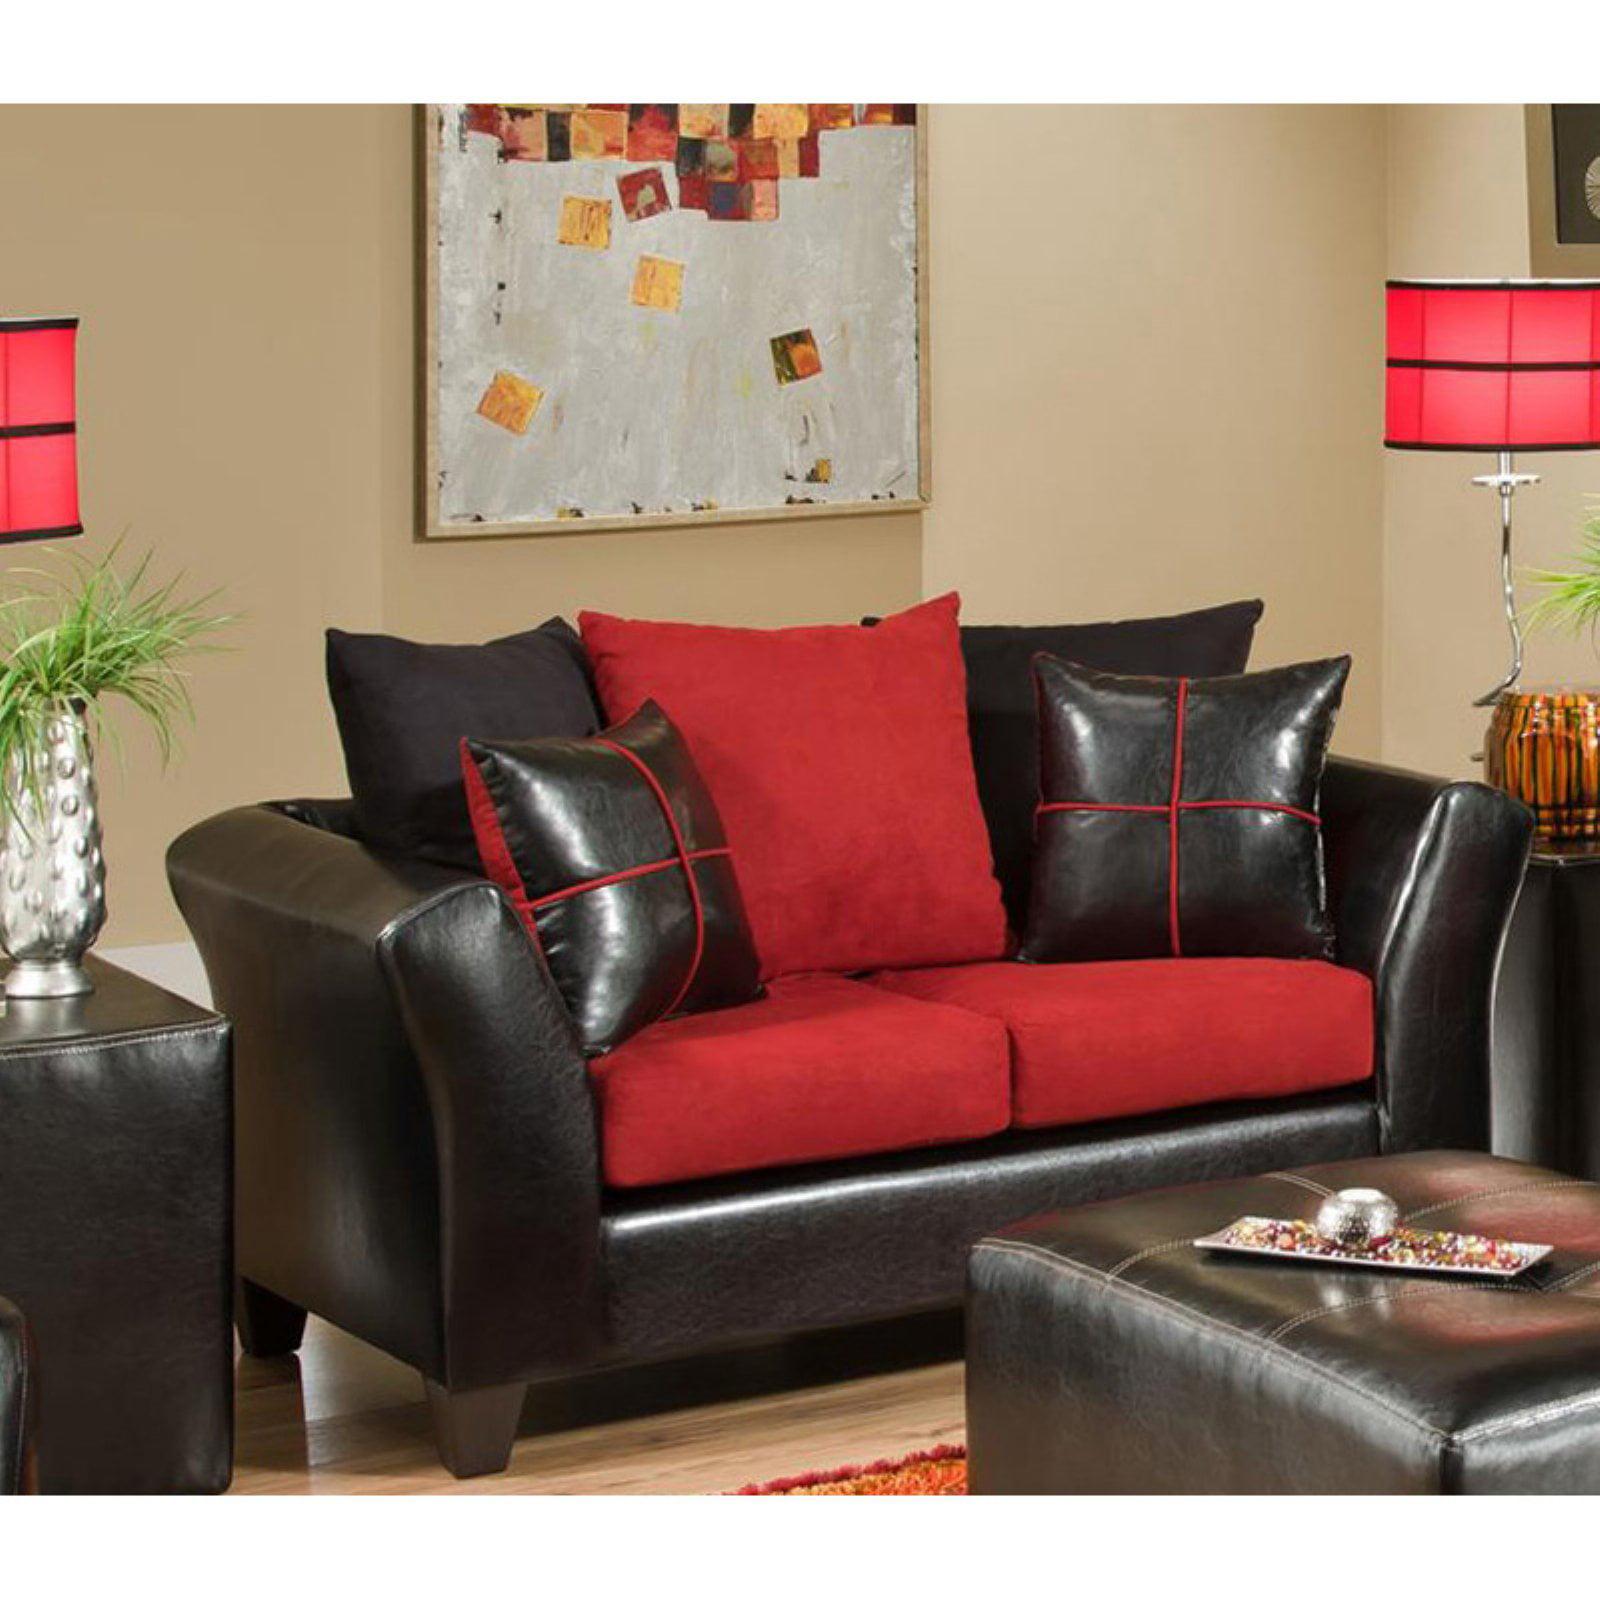 Chelsea Home Furniture Cira Loveseat